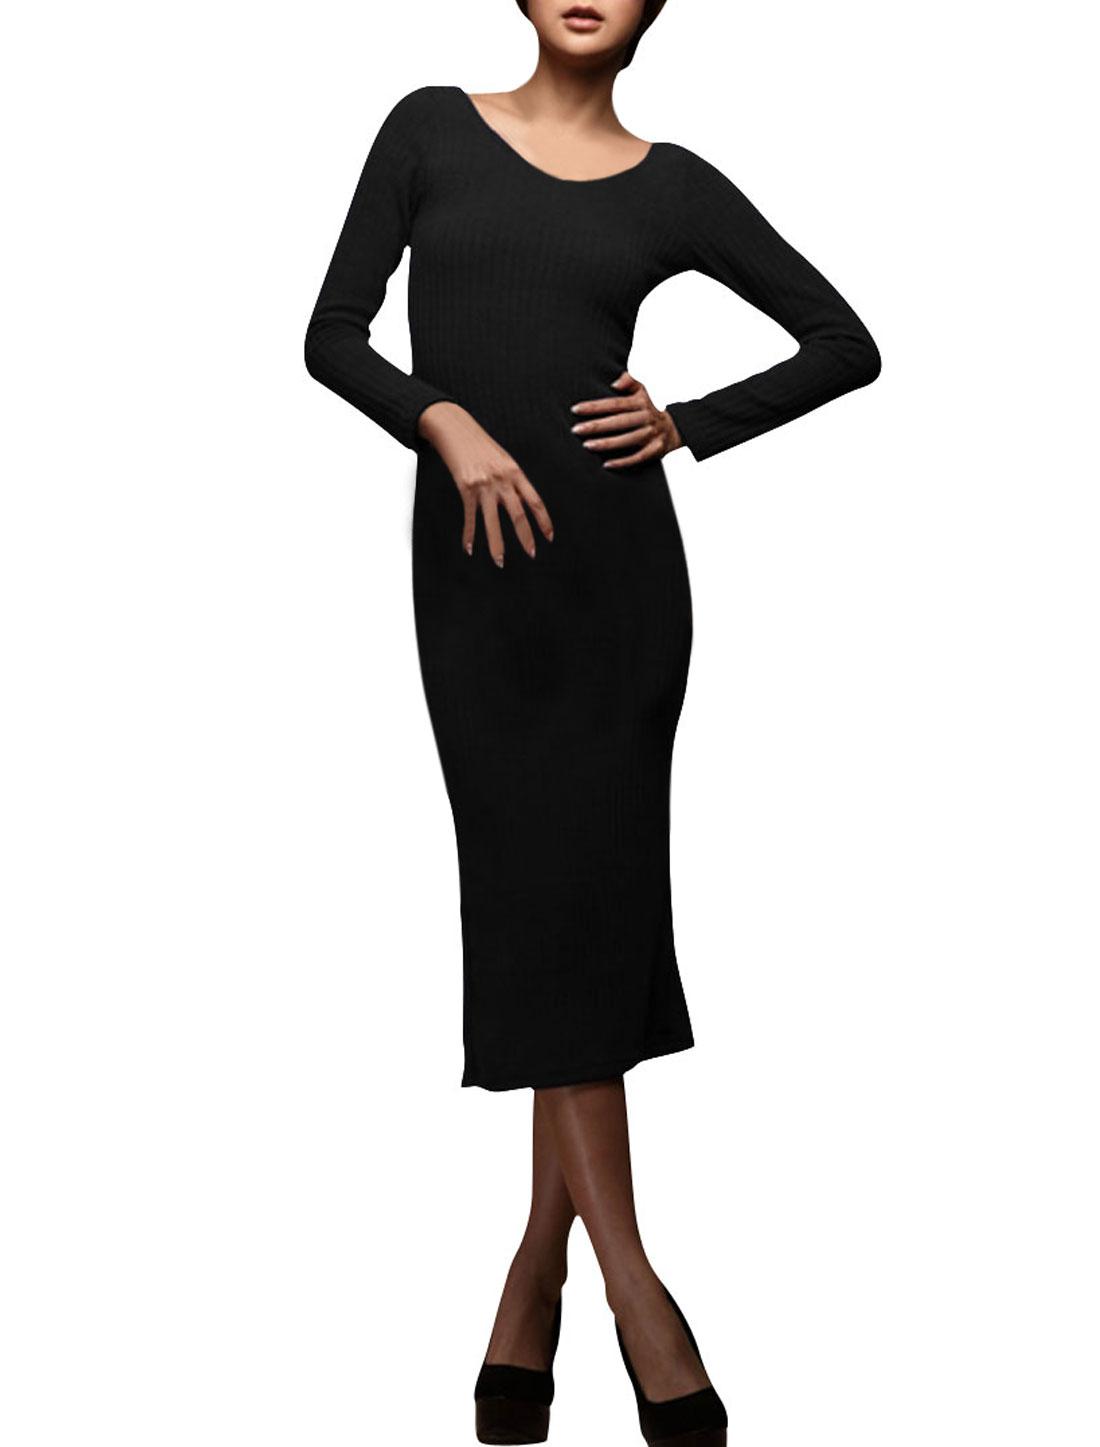 Lady Black Double V Neck Long Sleeve Ribbing Design Zipper Hem Mid-calf Dress Xs